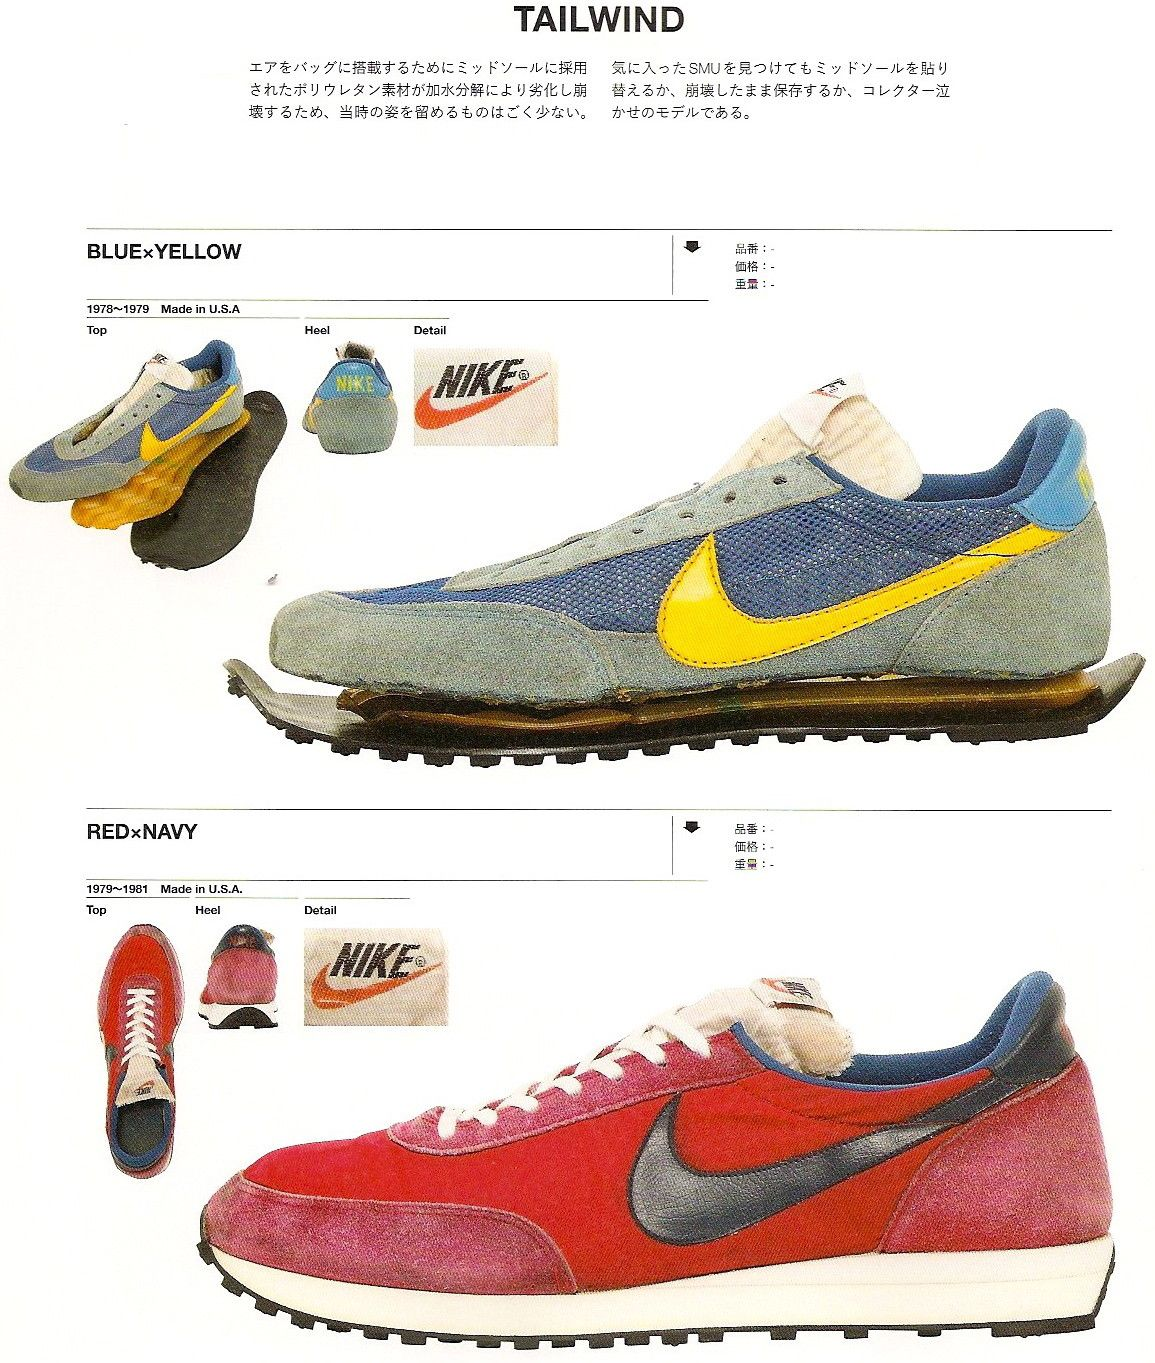 NIKE DAYBREAK - Google 搜尋 Vintage Nike, Oxfords, Loafers, Running Shoes,  Travel cc50735884